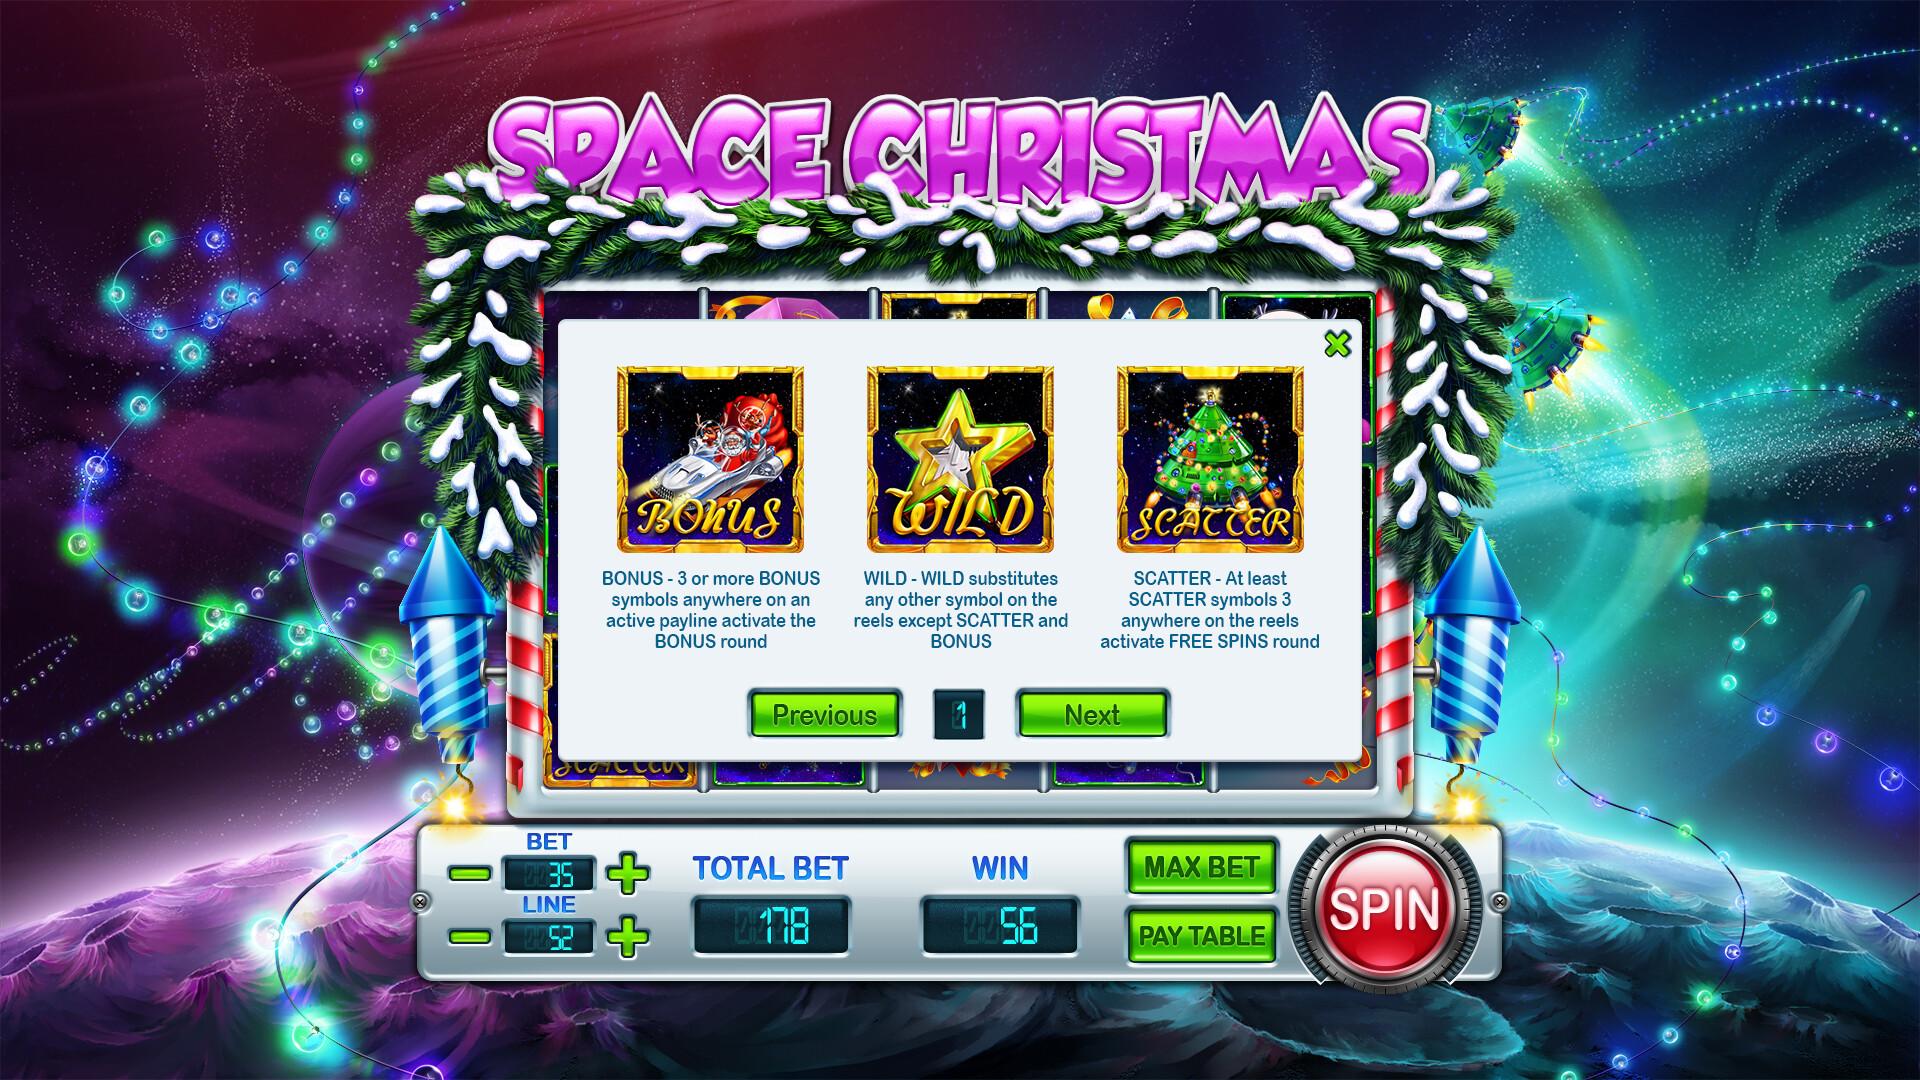 ArtStation - Space Christmas, sales slotmachines